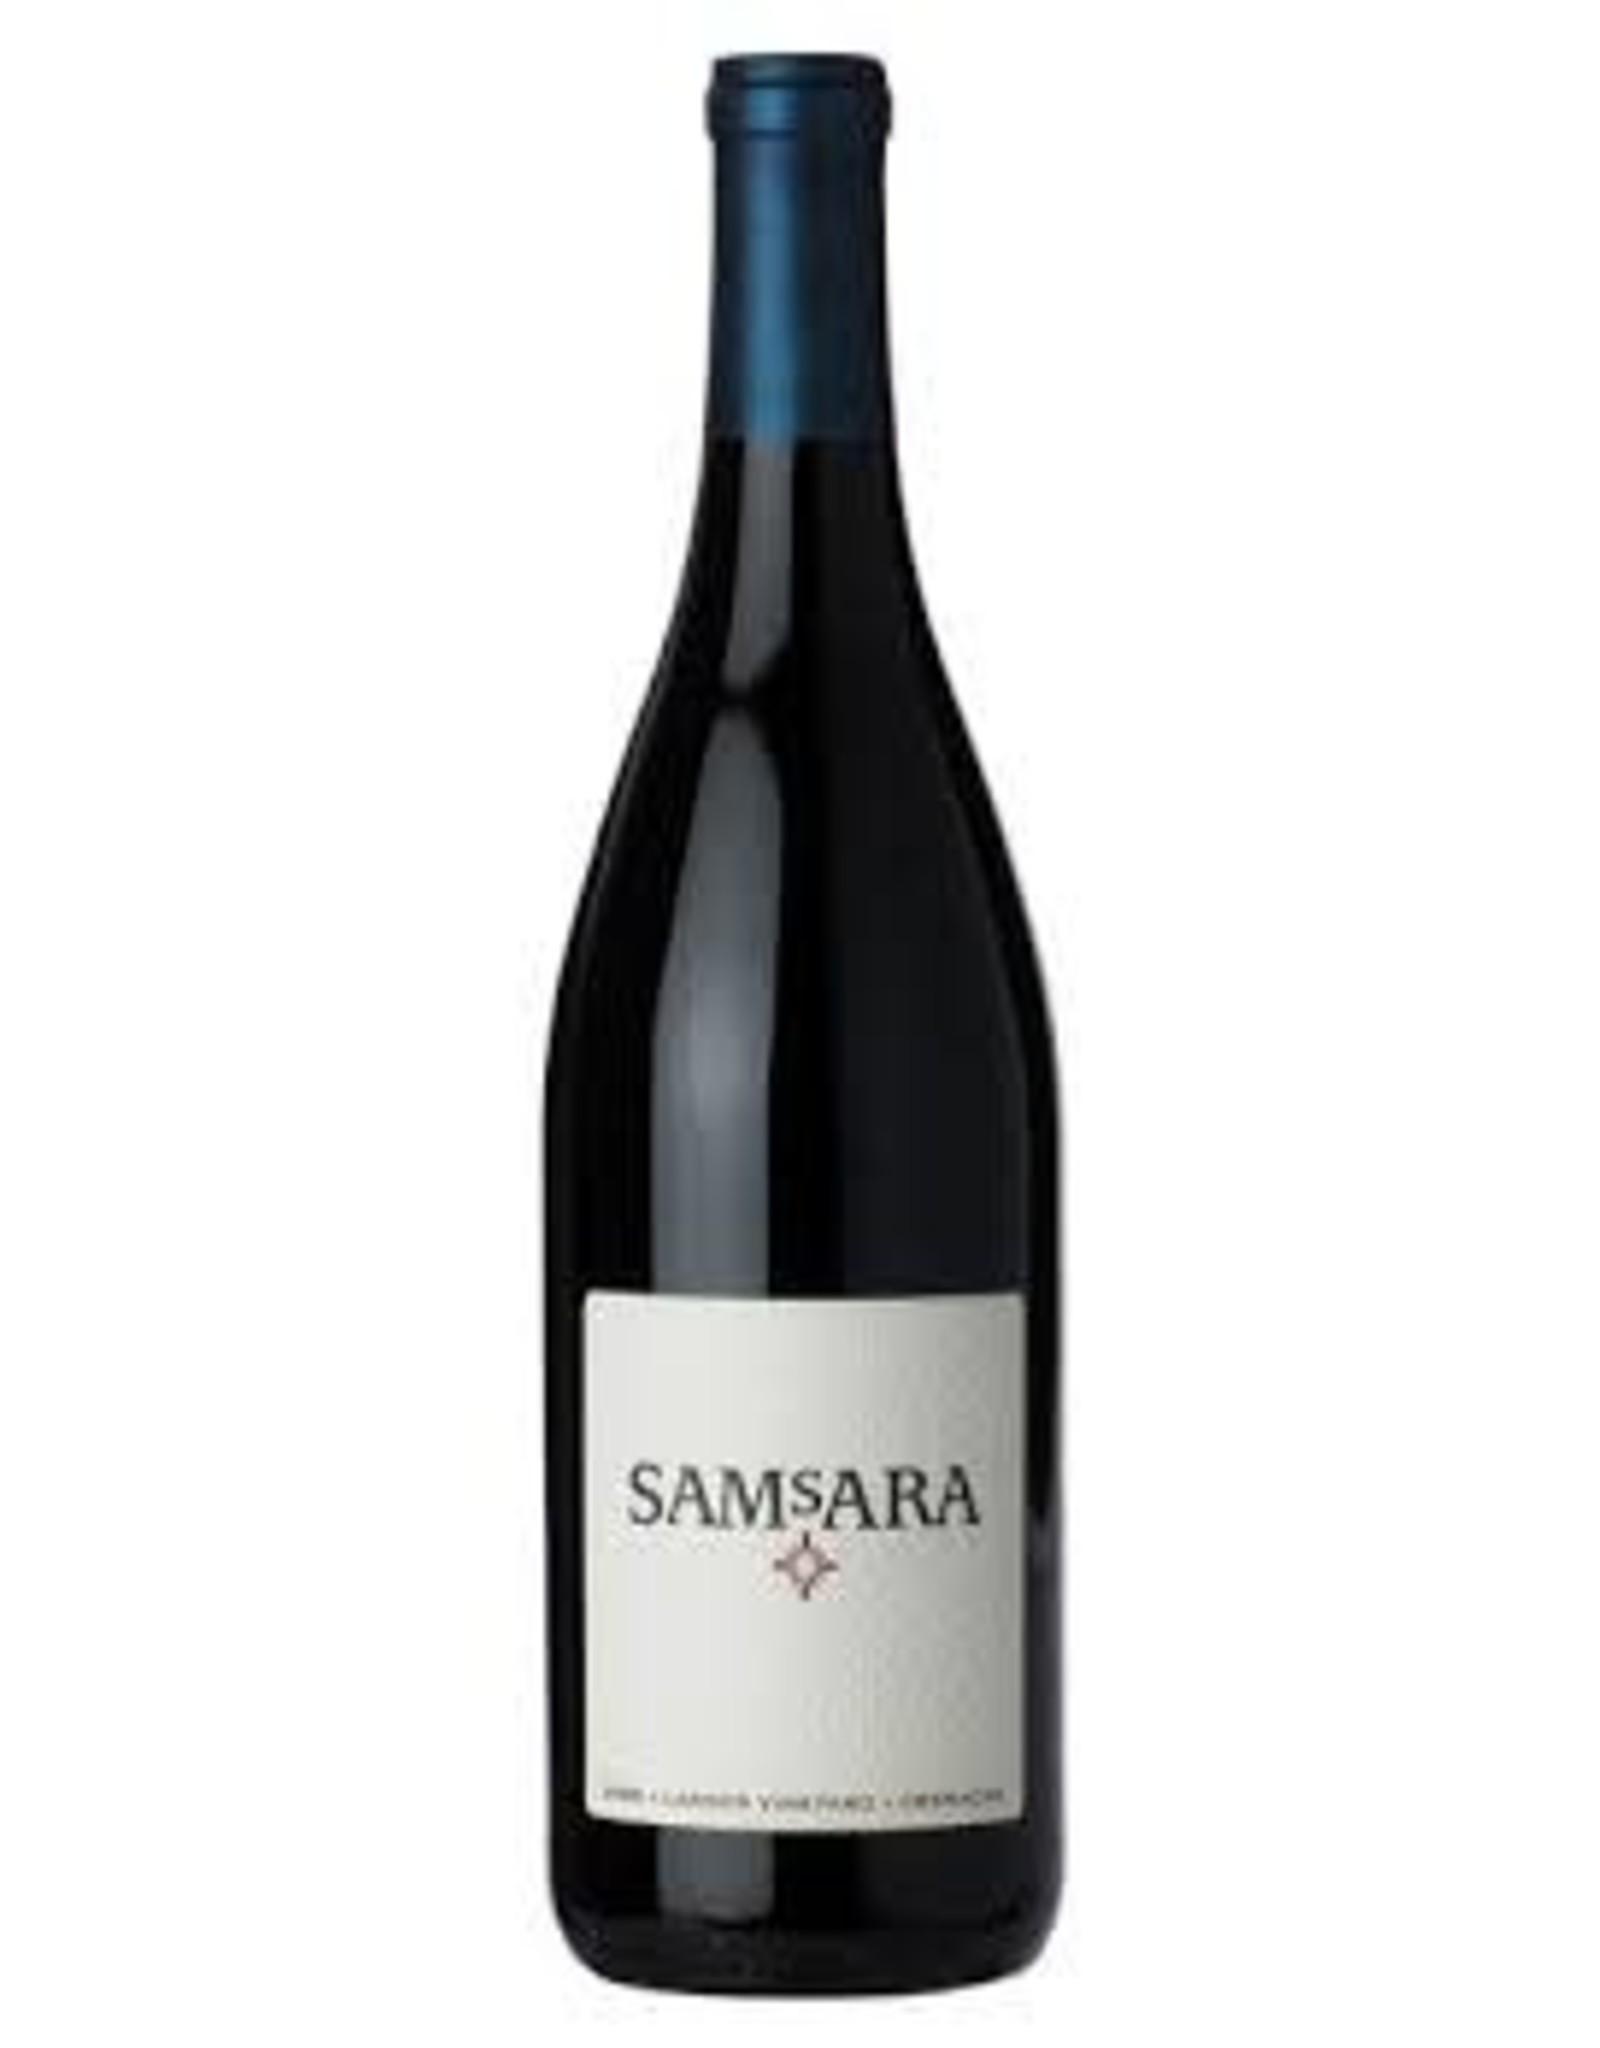 2010 Samsara Grenache